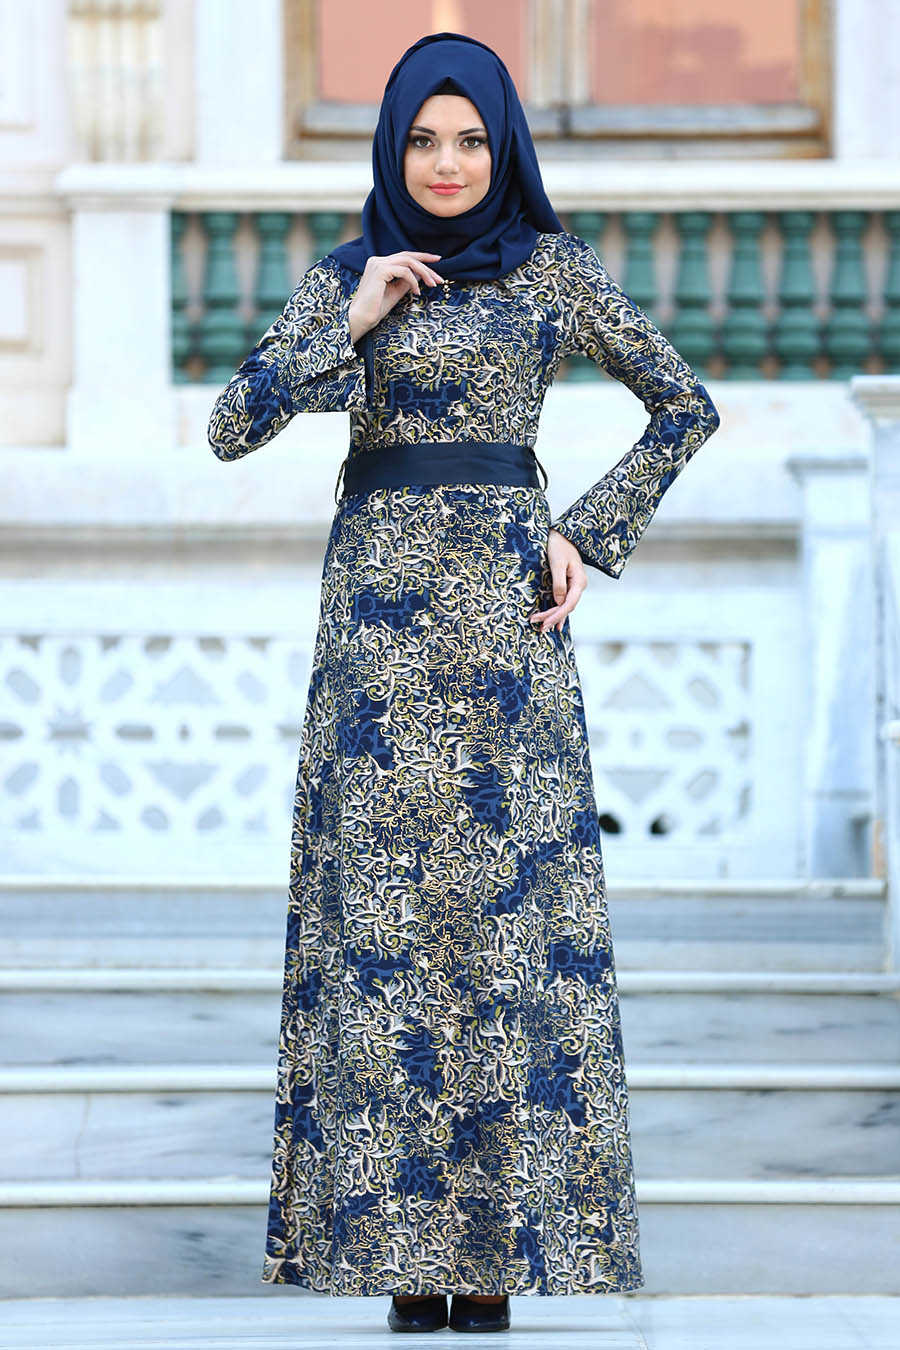 بالصور لبس بنات محجبات , اجمل ملابس للمحجبات 622 8